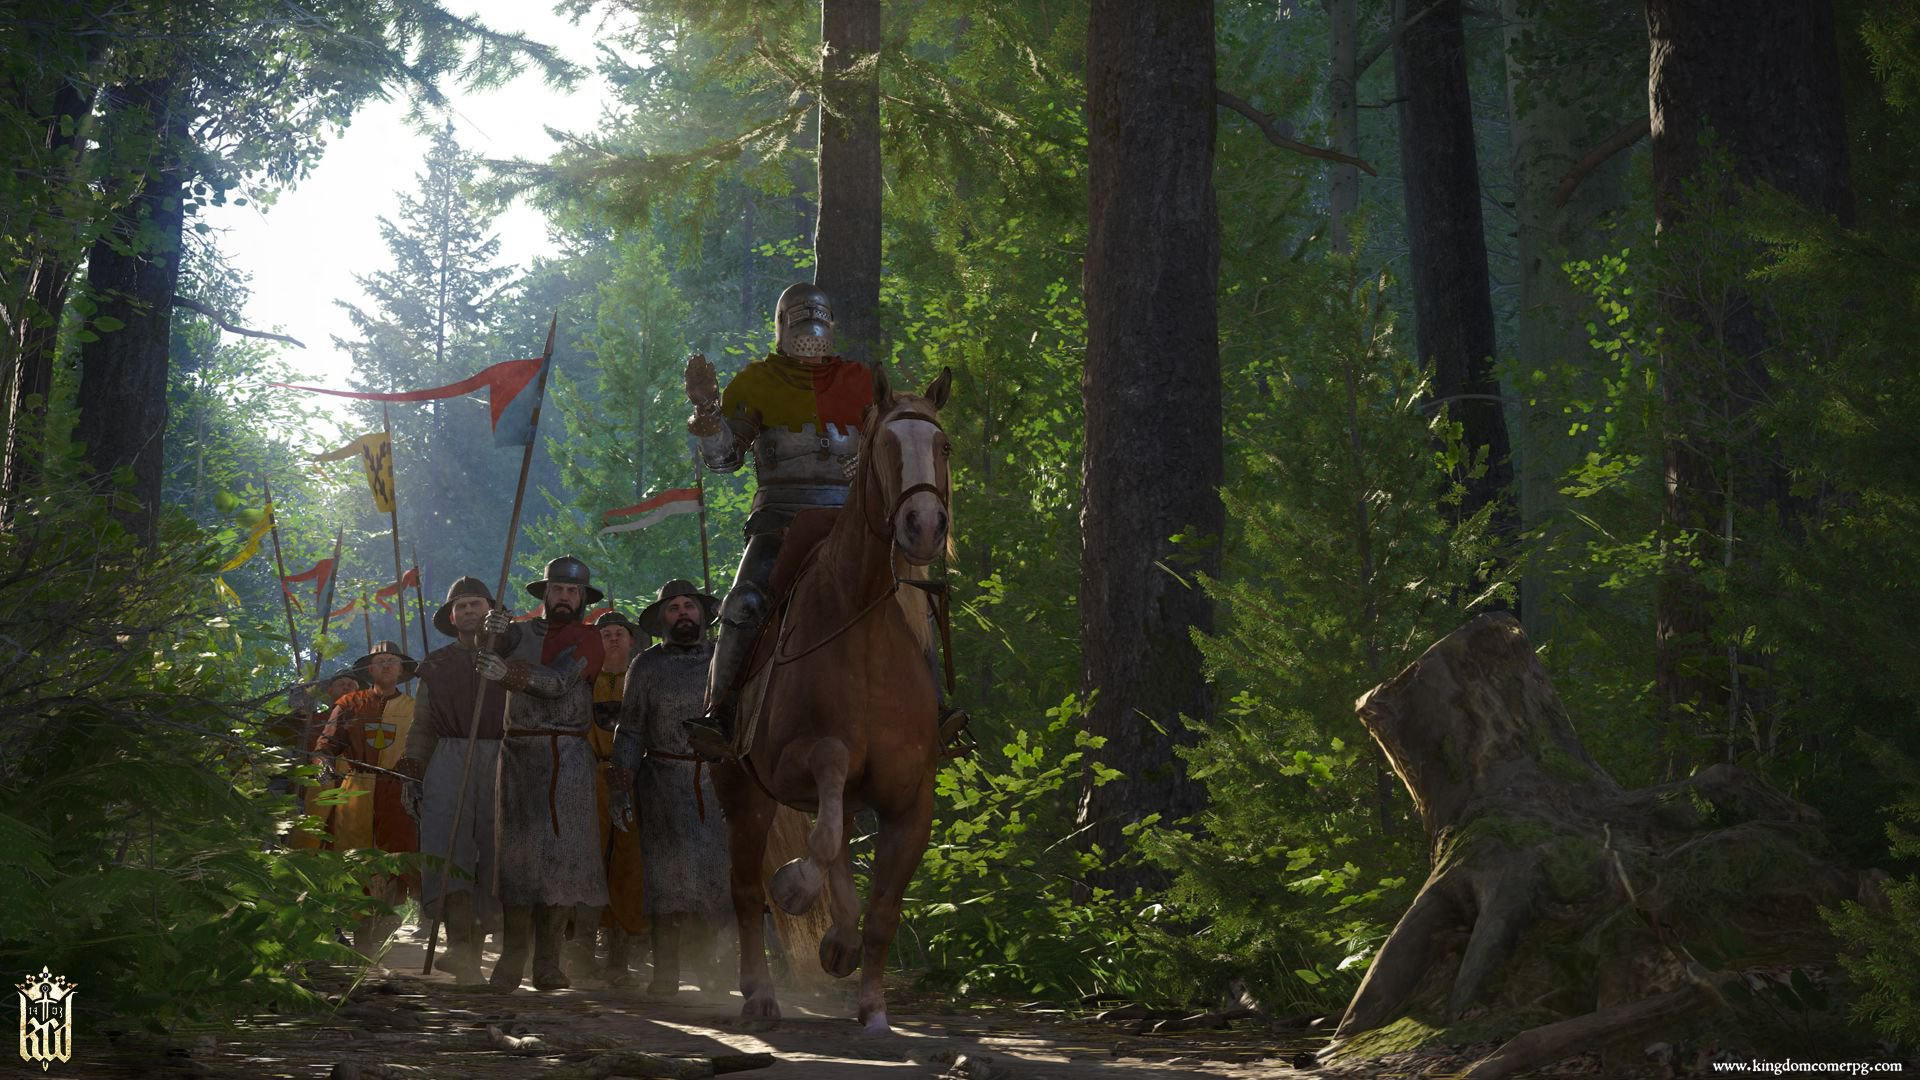 Обзор игры Kingdom Come: Deliverance: из грязи в князи